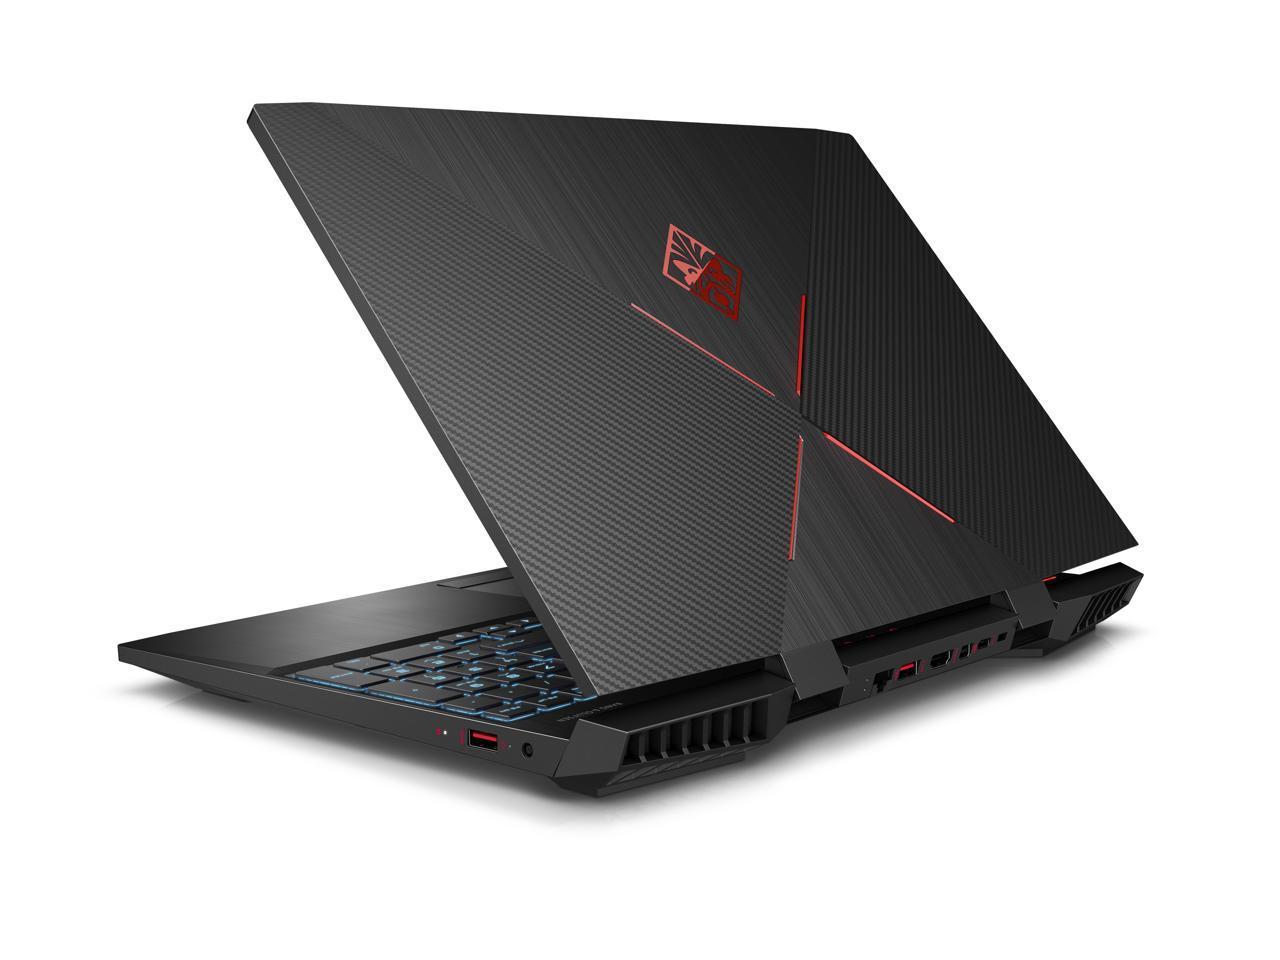 Omen by HP Gaming Laptop 15.6